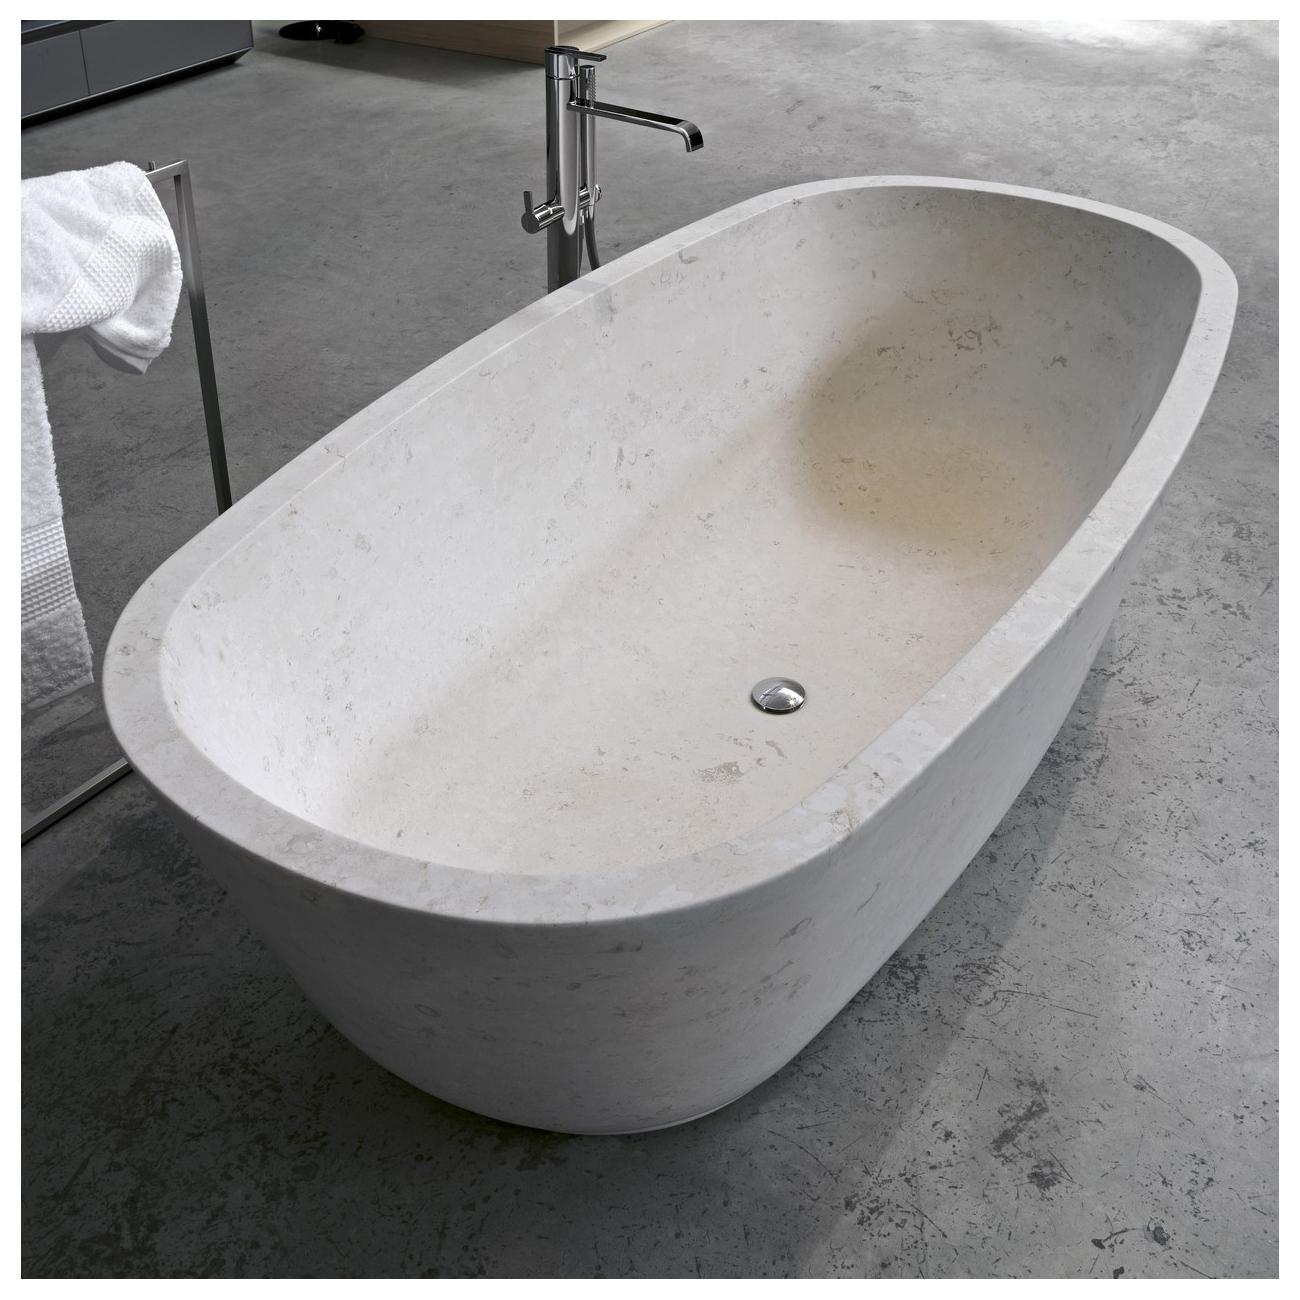 Antonio lupi baia vasca in pietra luna tattahome - Vasca da bagno in pietra ...